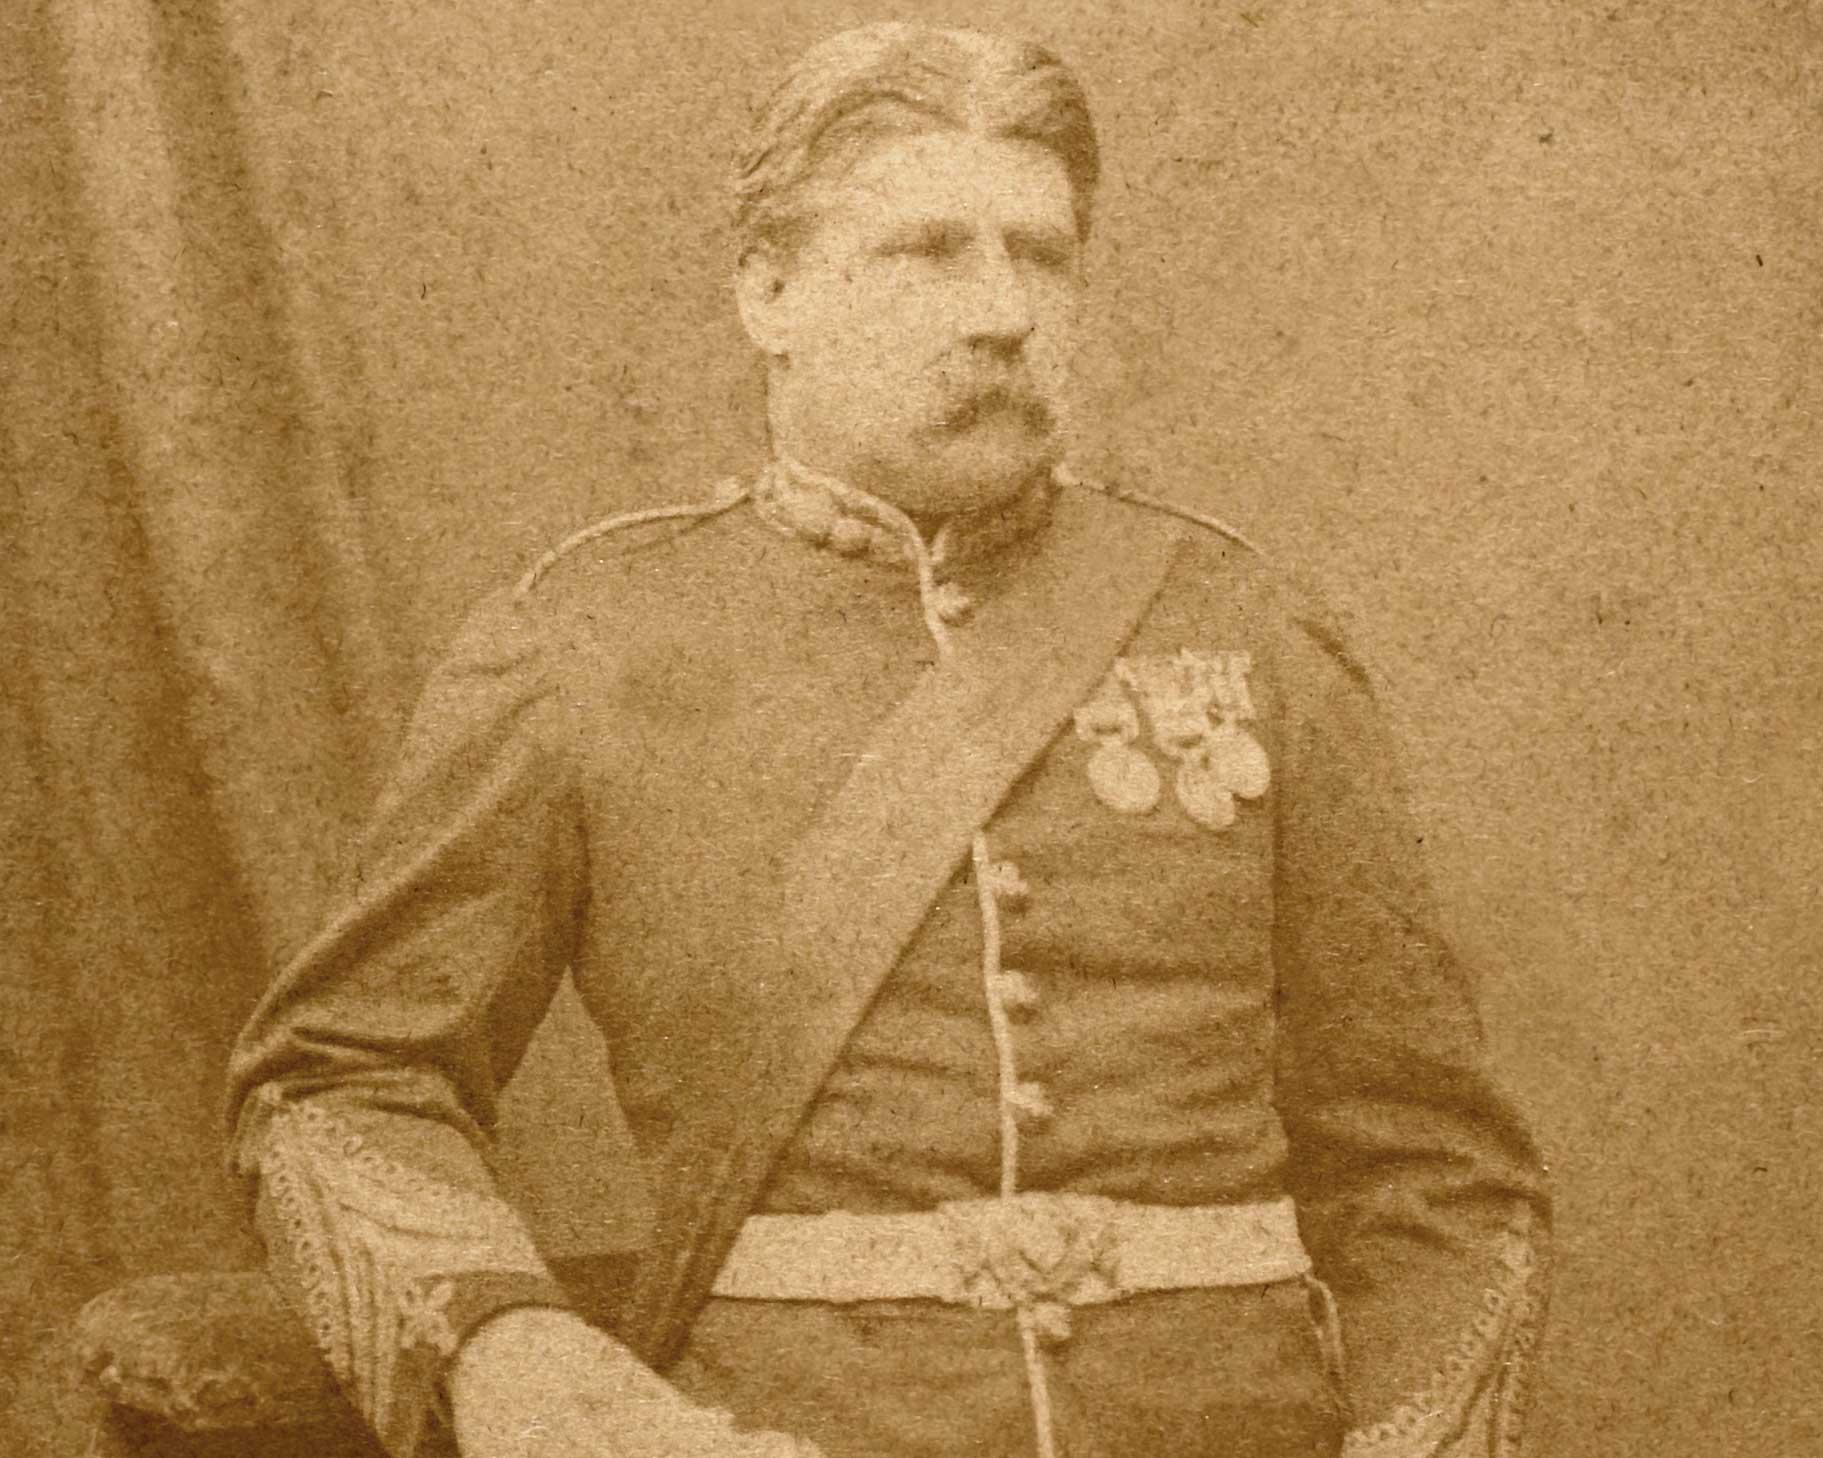 Lieutenant Colonel Campbell Clark, 104th Regiment of Foot (Bengal Fusiliers), c1877